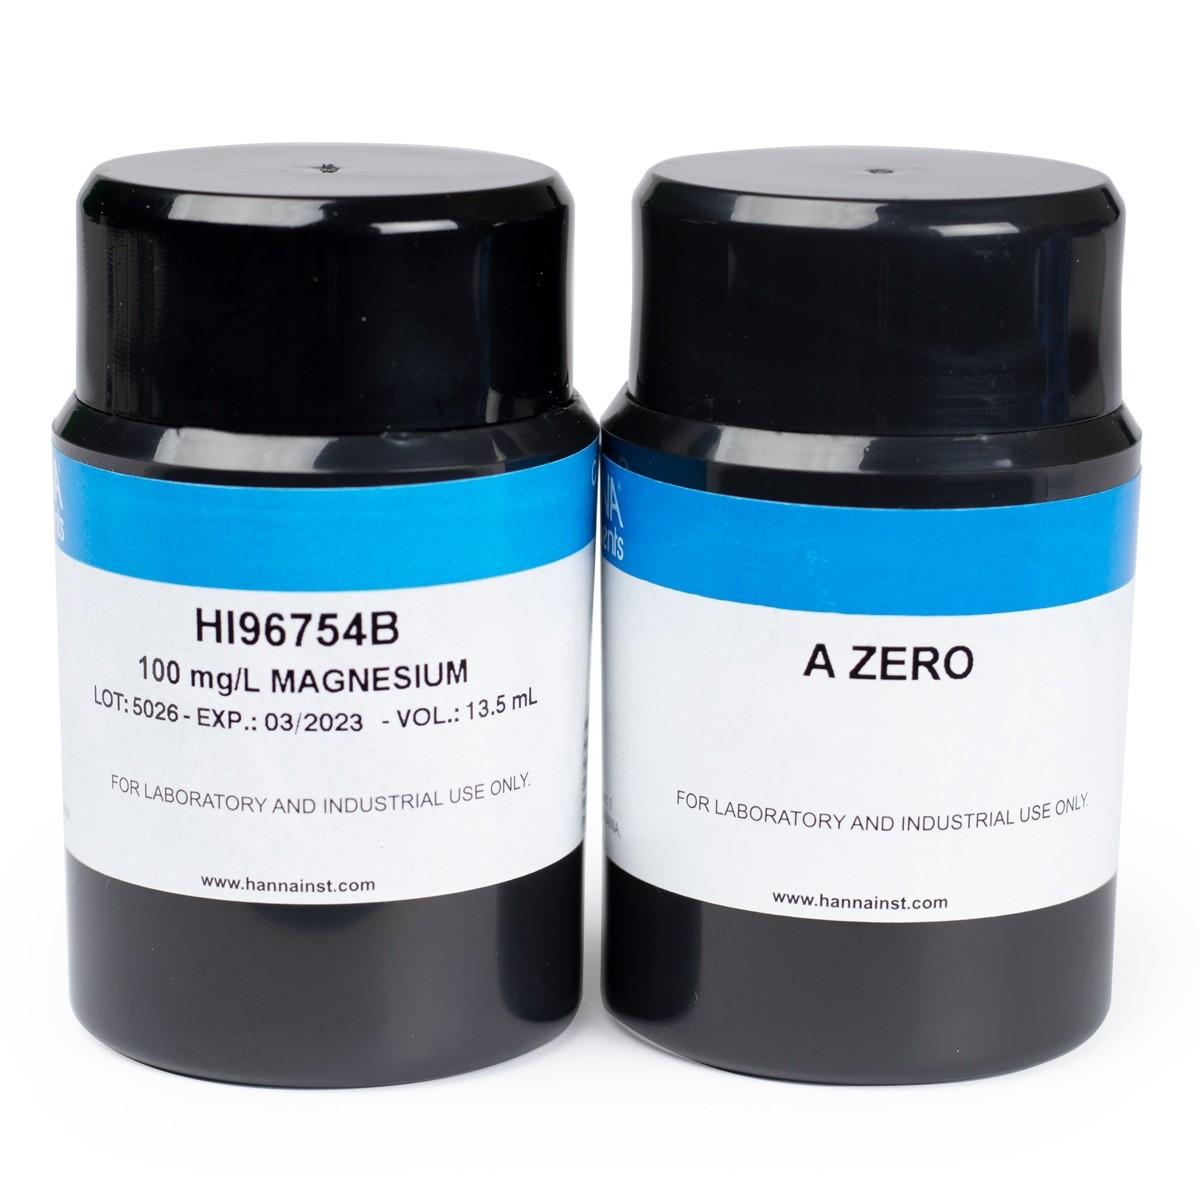 HI96754-11 Magnesium CAL Check™ Standards